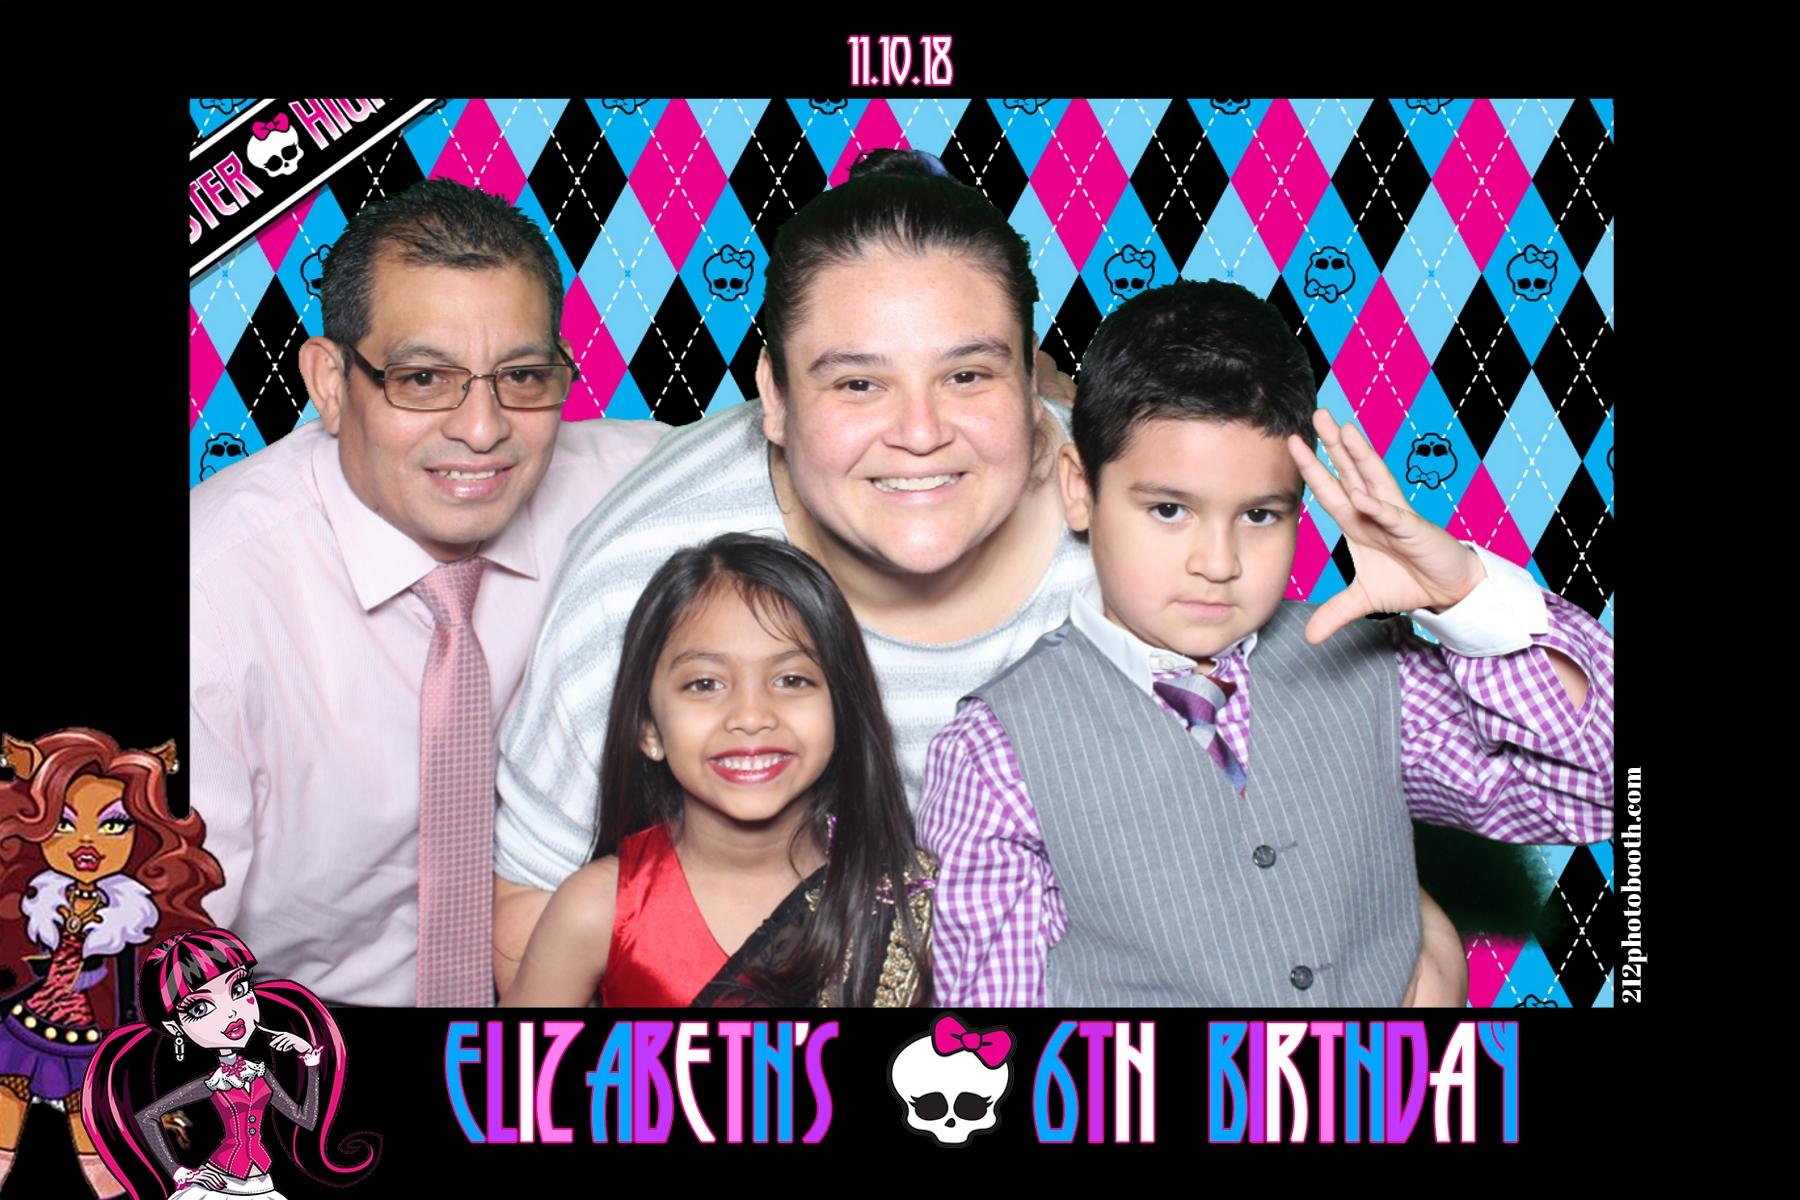 elisabeth birthday party photo